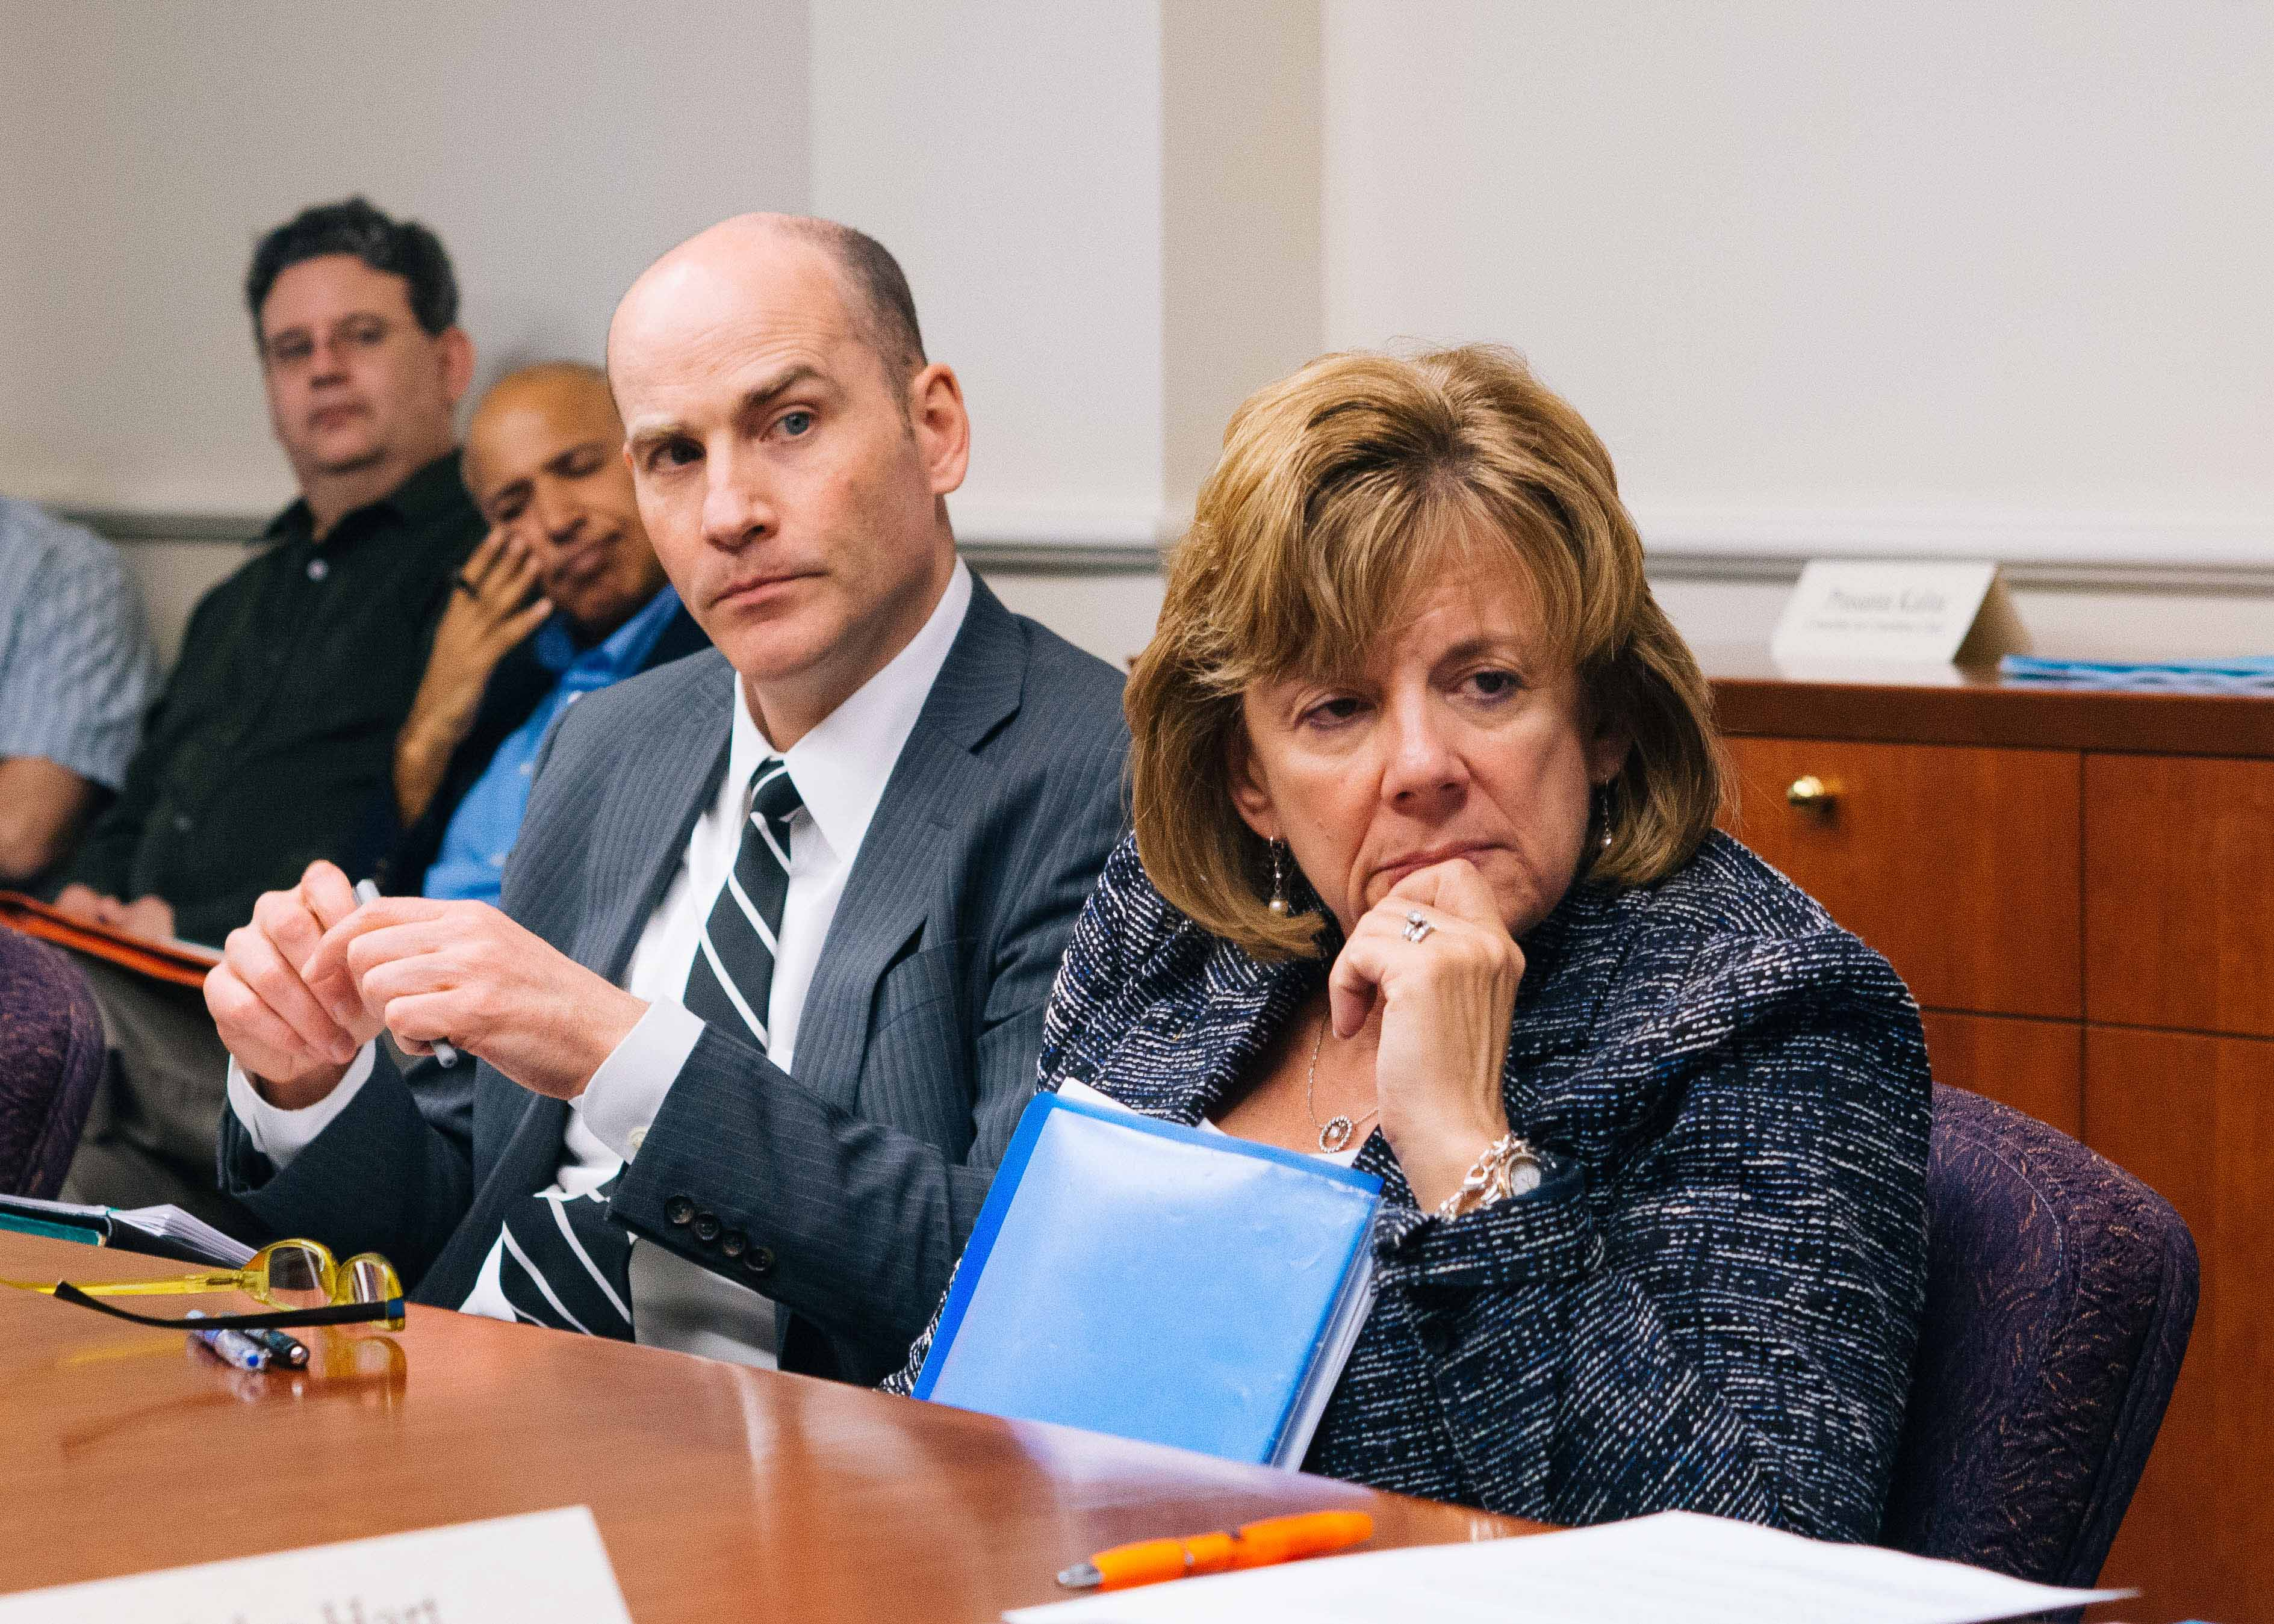 Interim Vice Chancellor Edward Feser and Interim Chancellor Barbara Wilson listen during the SEC meeting in Urbana on April 25.